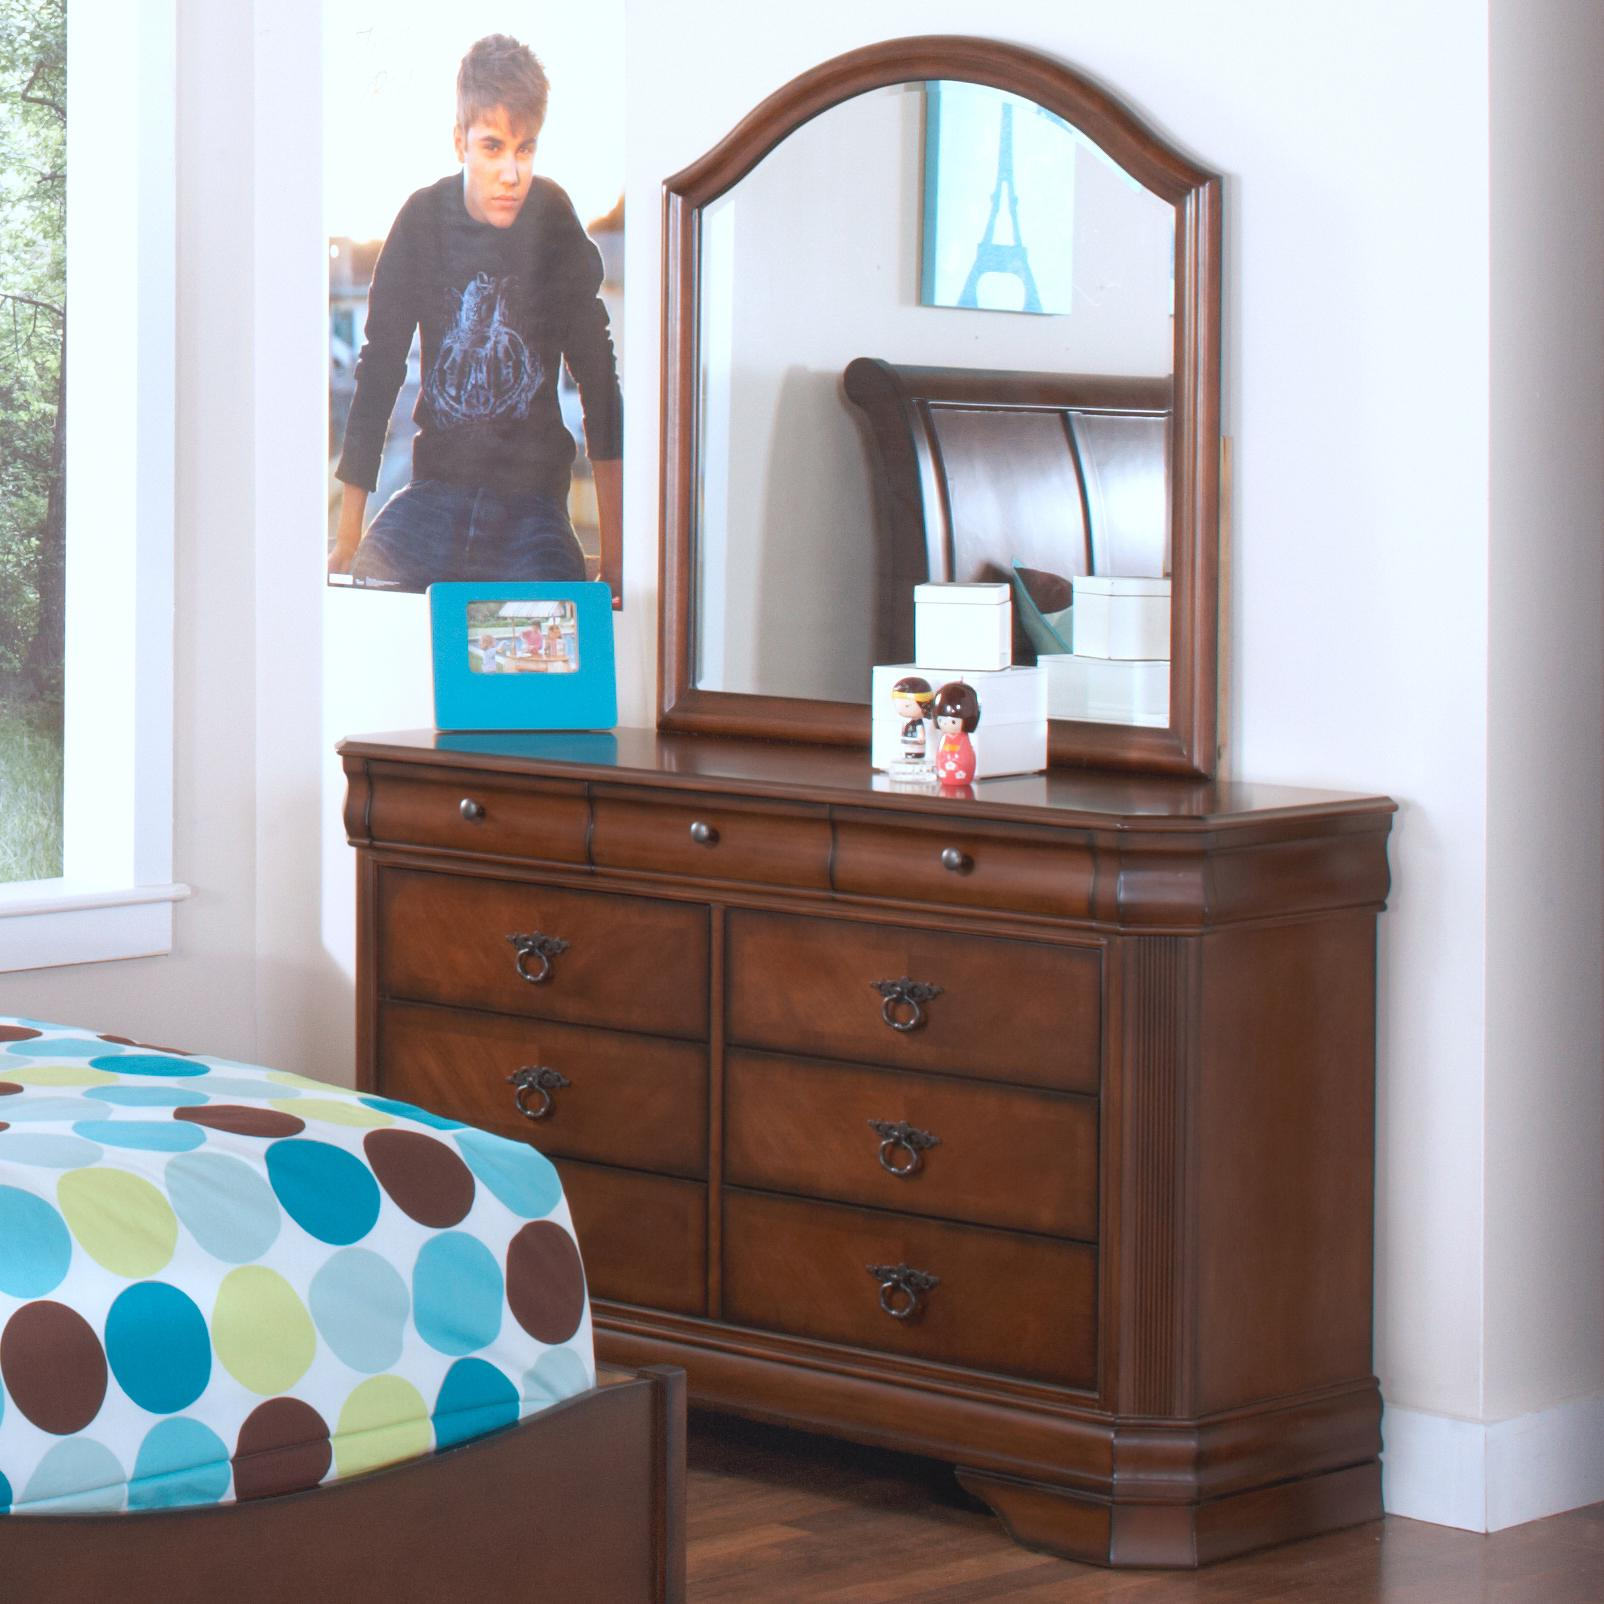 New Classic Sheridan Youth Dresser w/ Beveled Mirror - Royal Furniture - Dresser u0026 Mirror